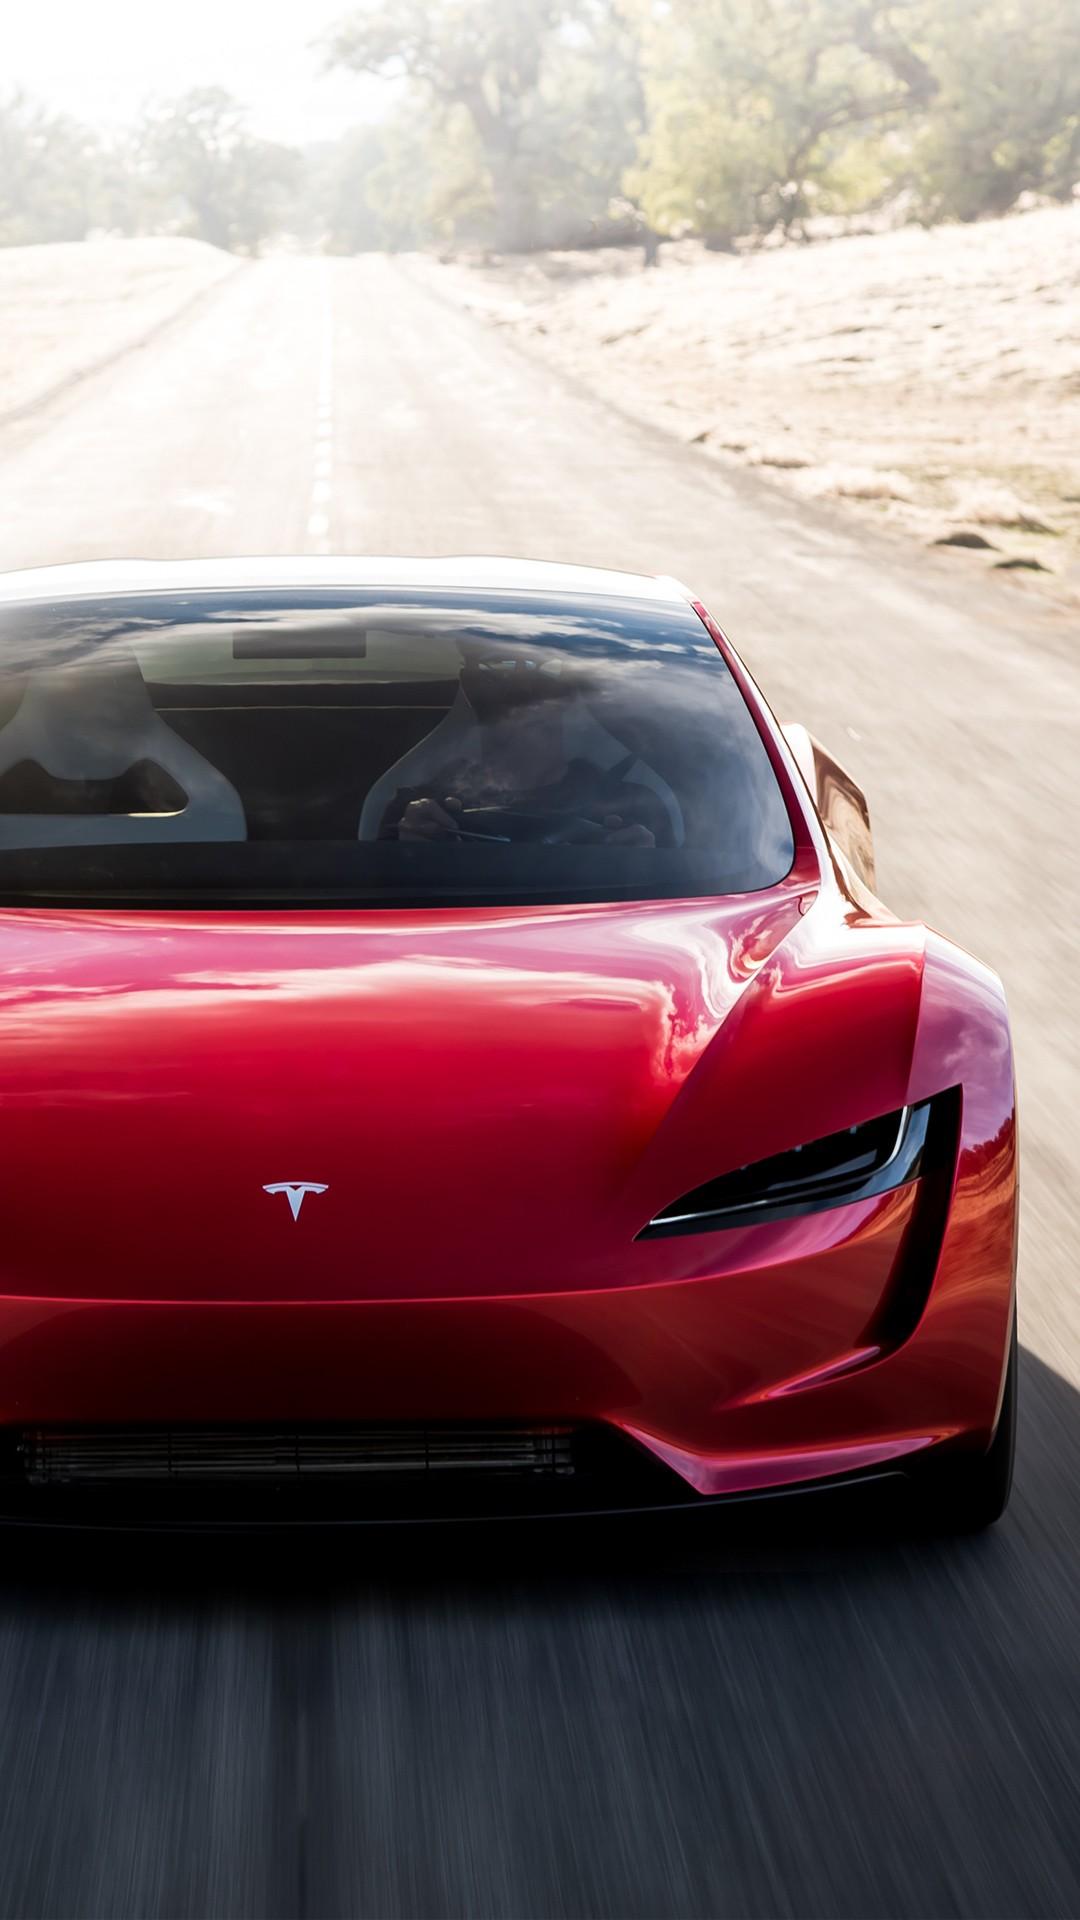 Download New Tesla Roadster Wallpaper Widescreen a8R 1080x1920